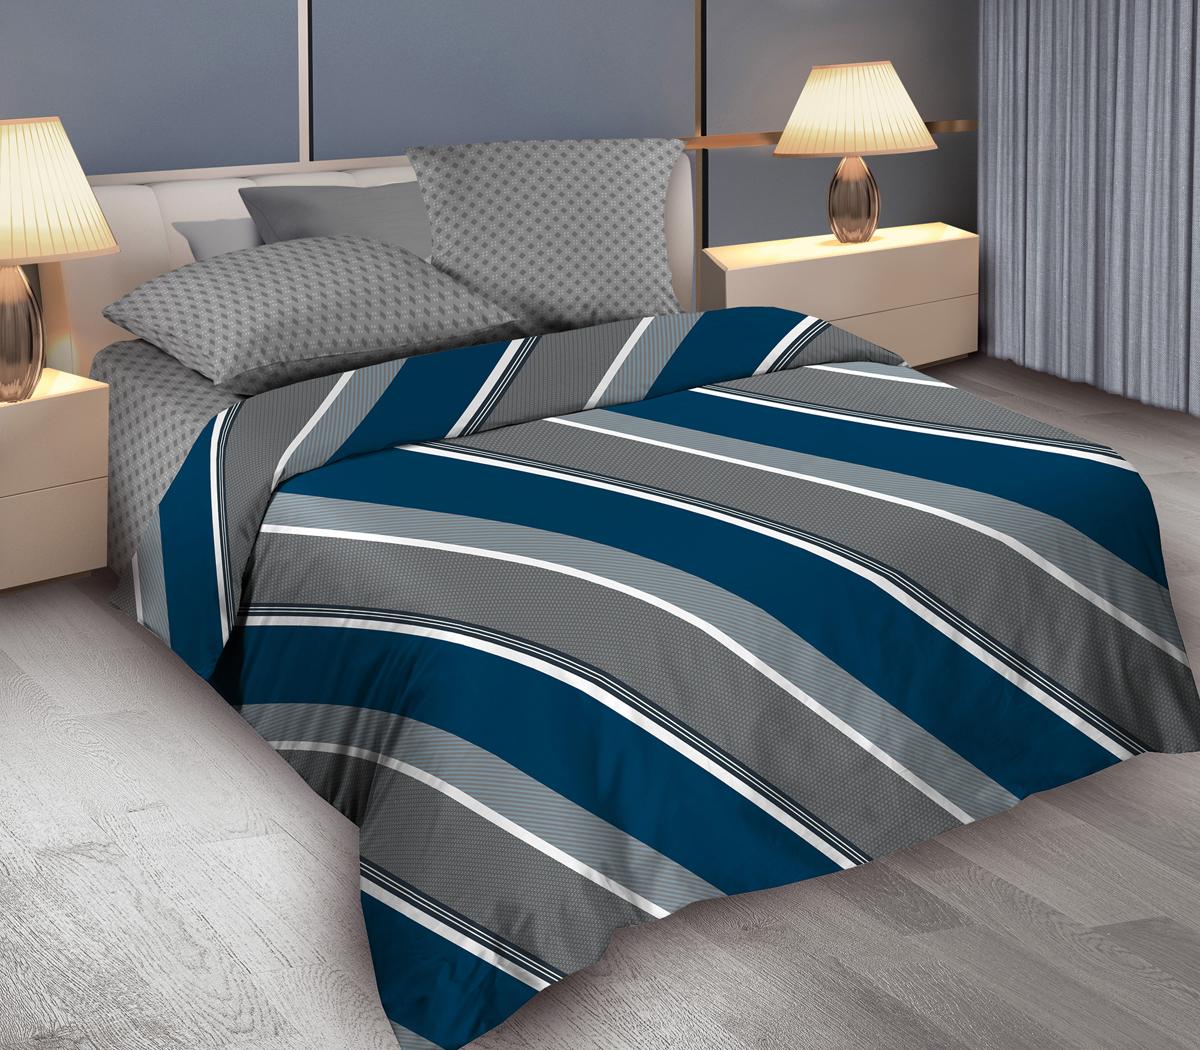 Комплект белья Wenge Gentle, евро, наволочки 70x70, цвет: серый